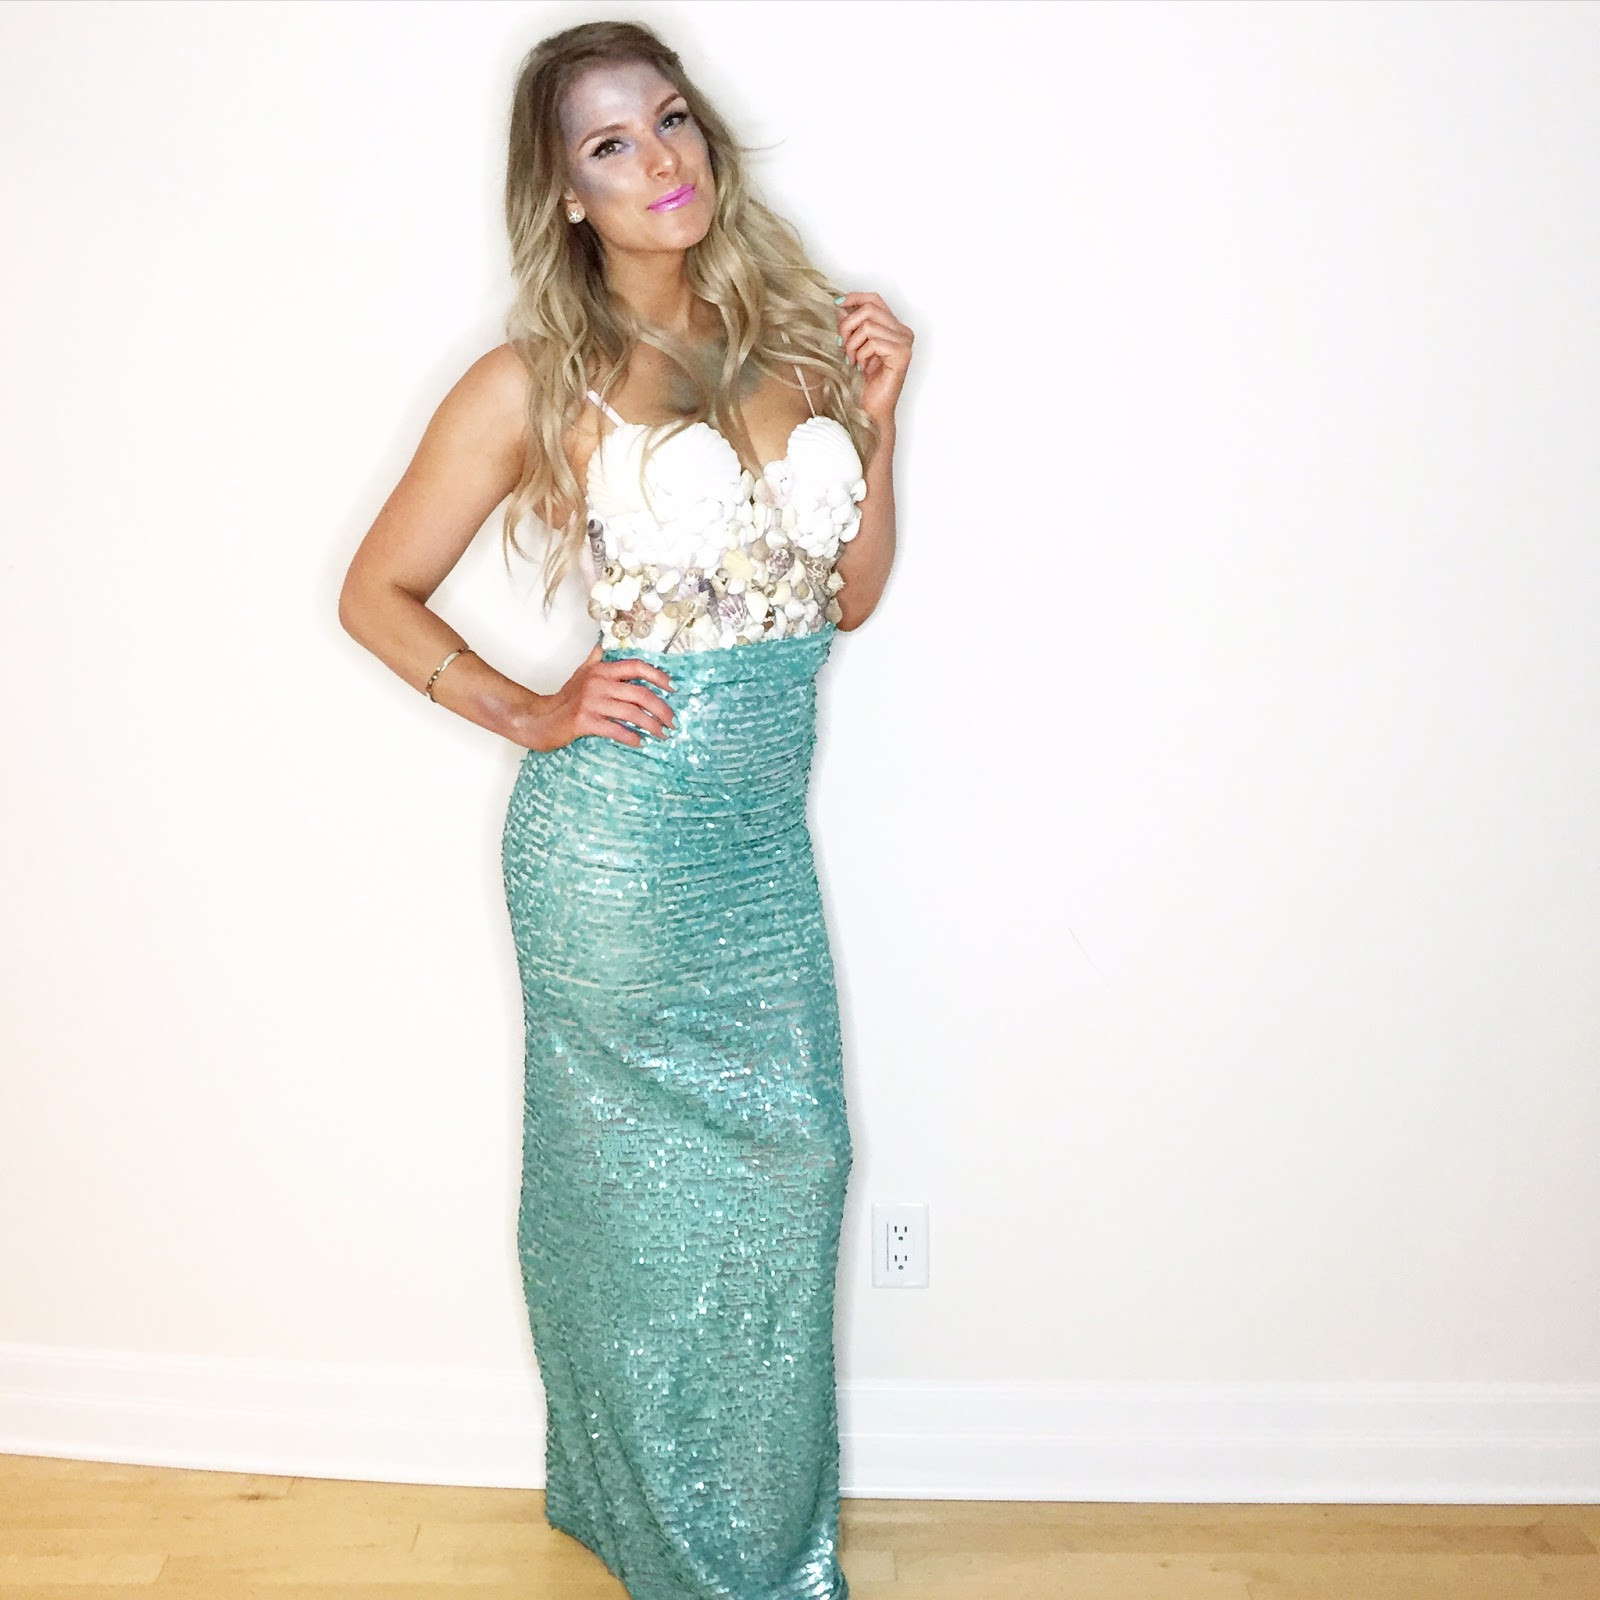 Mermaid DIY Costumes  15 Super Creative Halloween Costumes You Can DIY